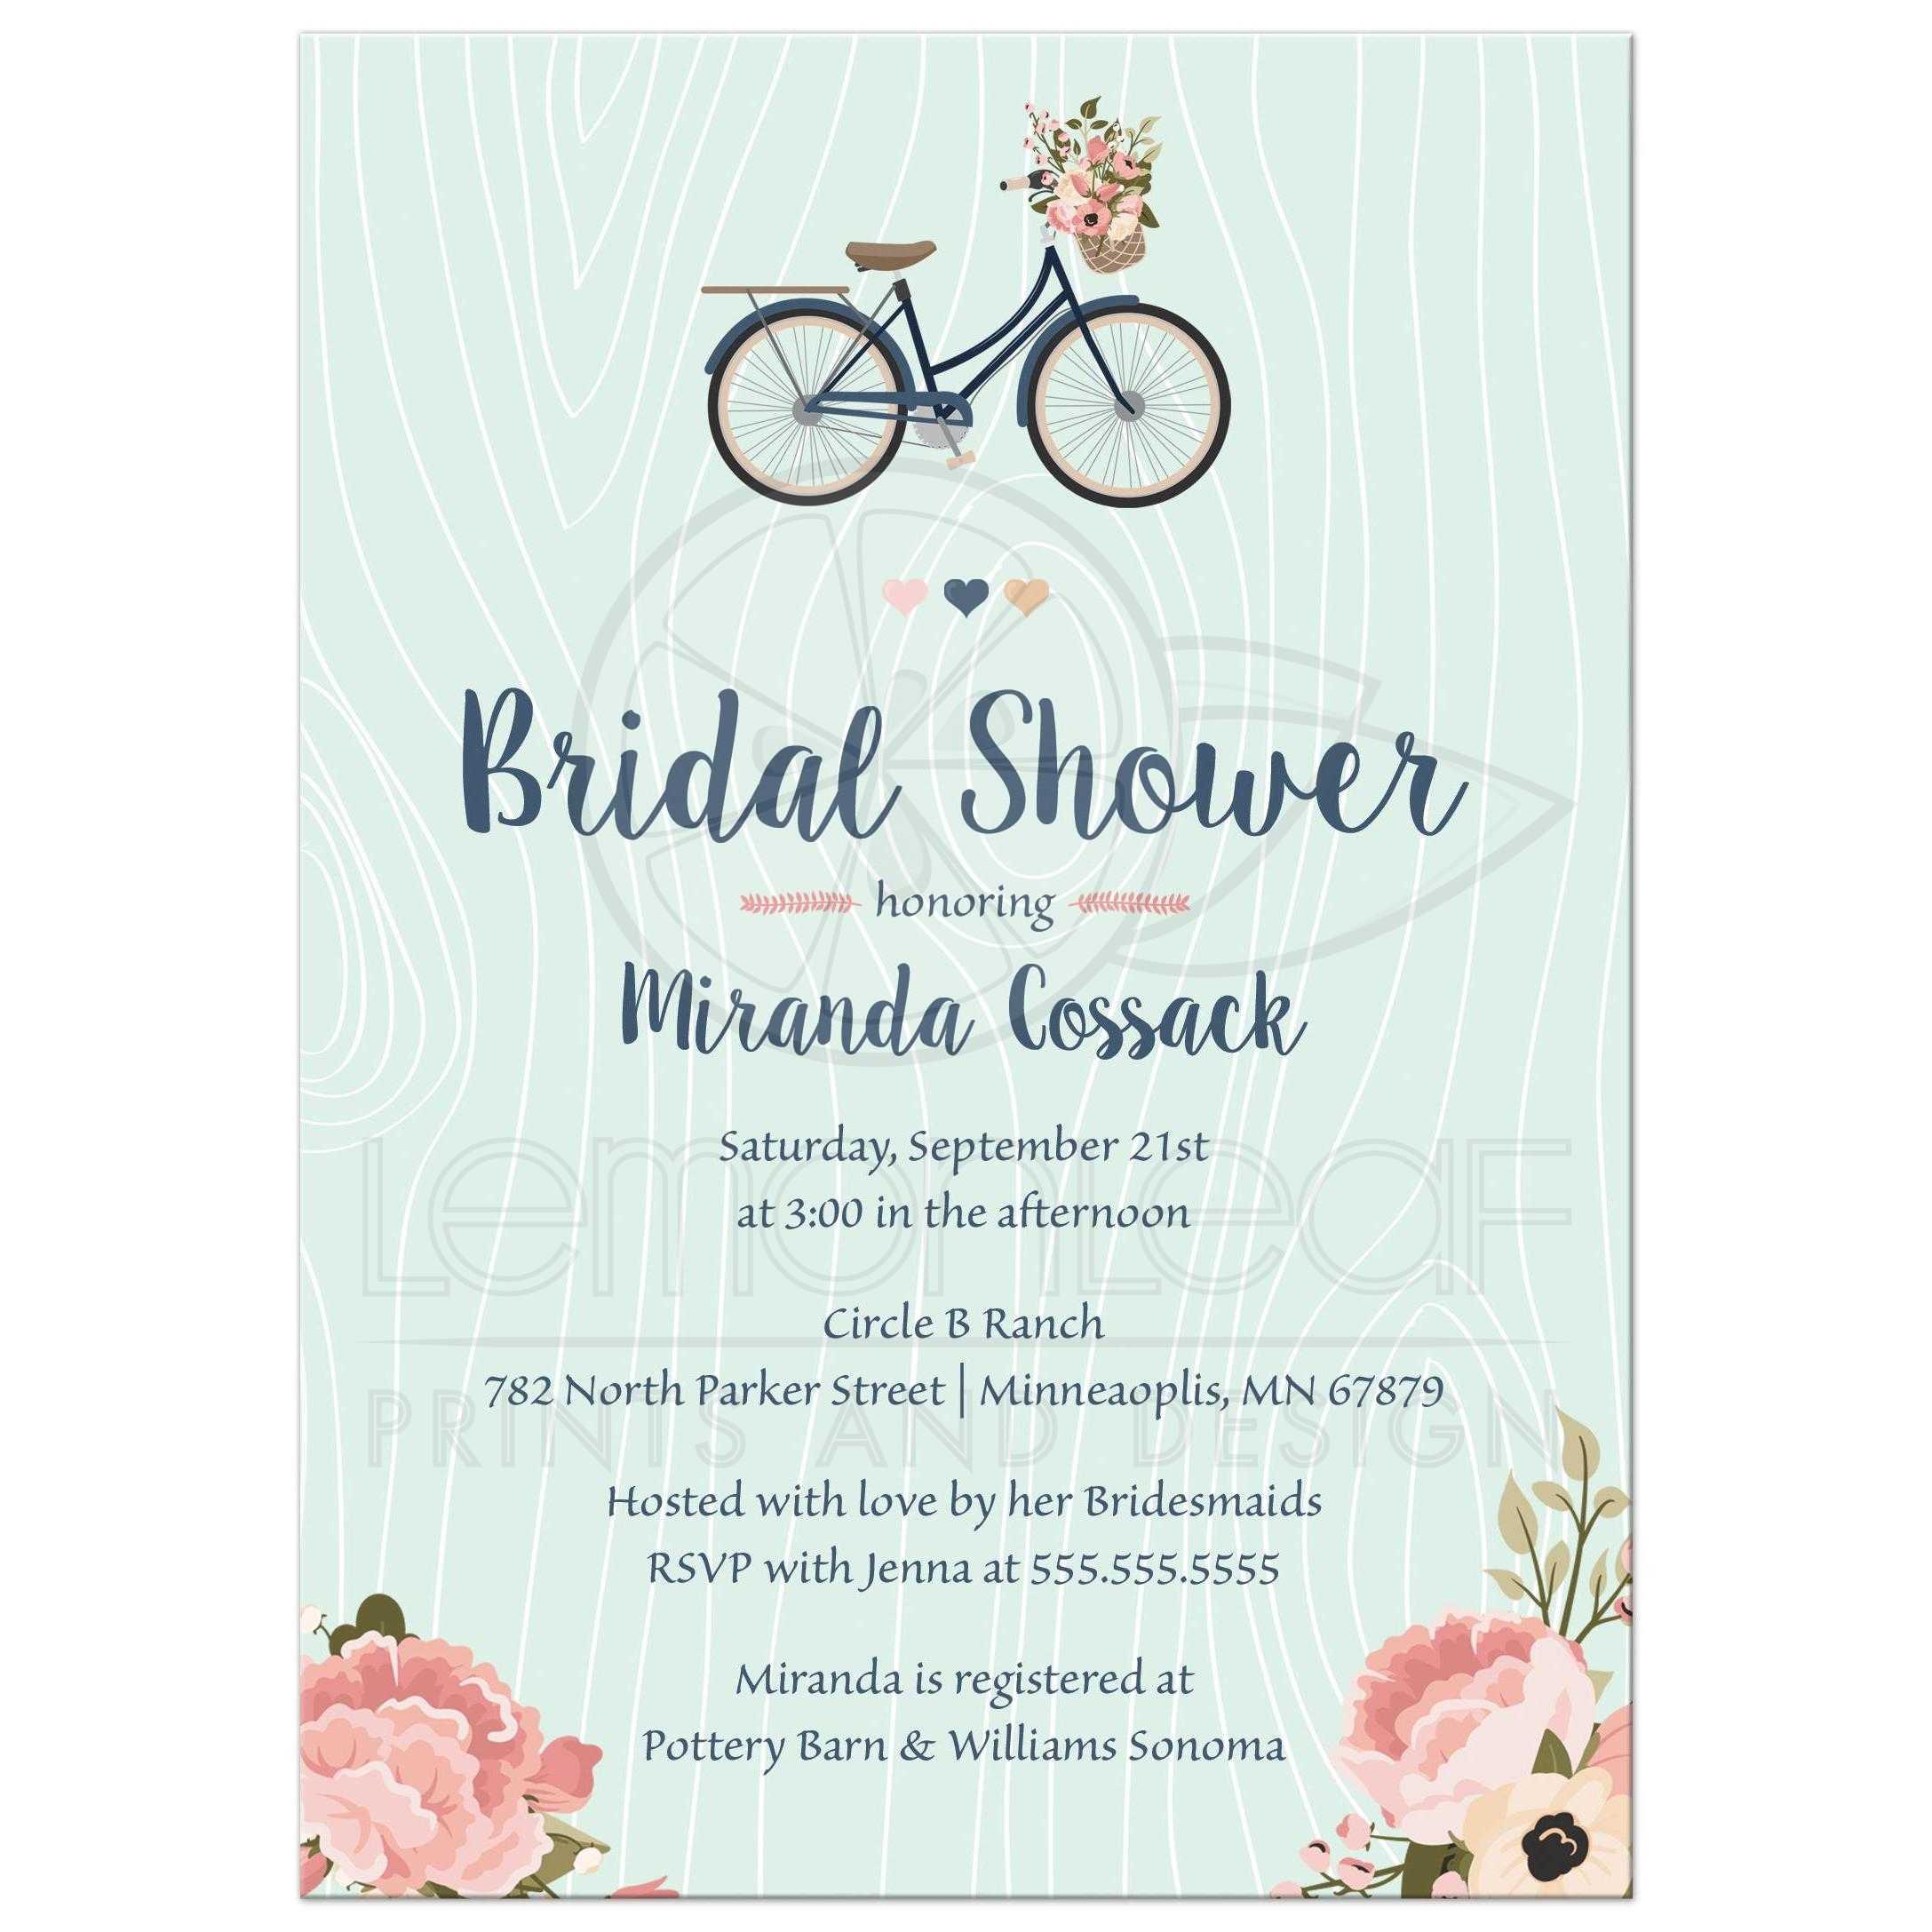 Bridal shower invitation blush and navy floral bike blush pink and navy floral bike bridal shower invitation filmwisefo Choice Image